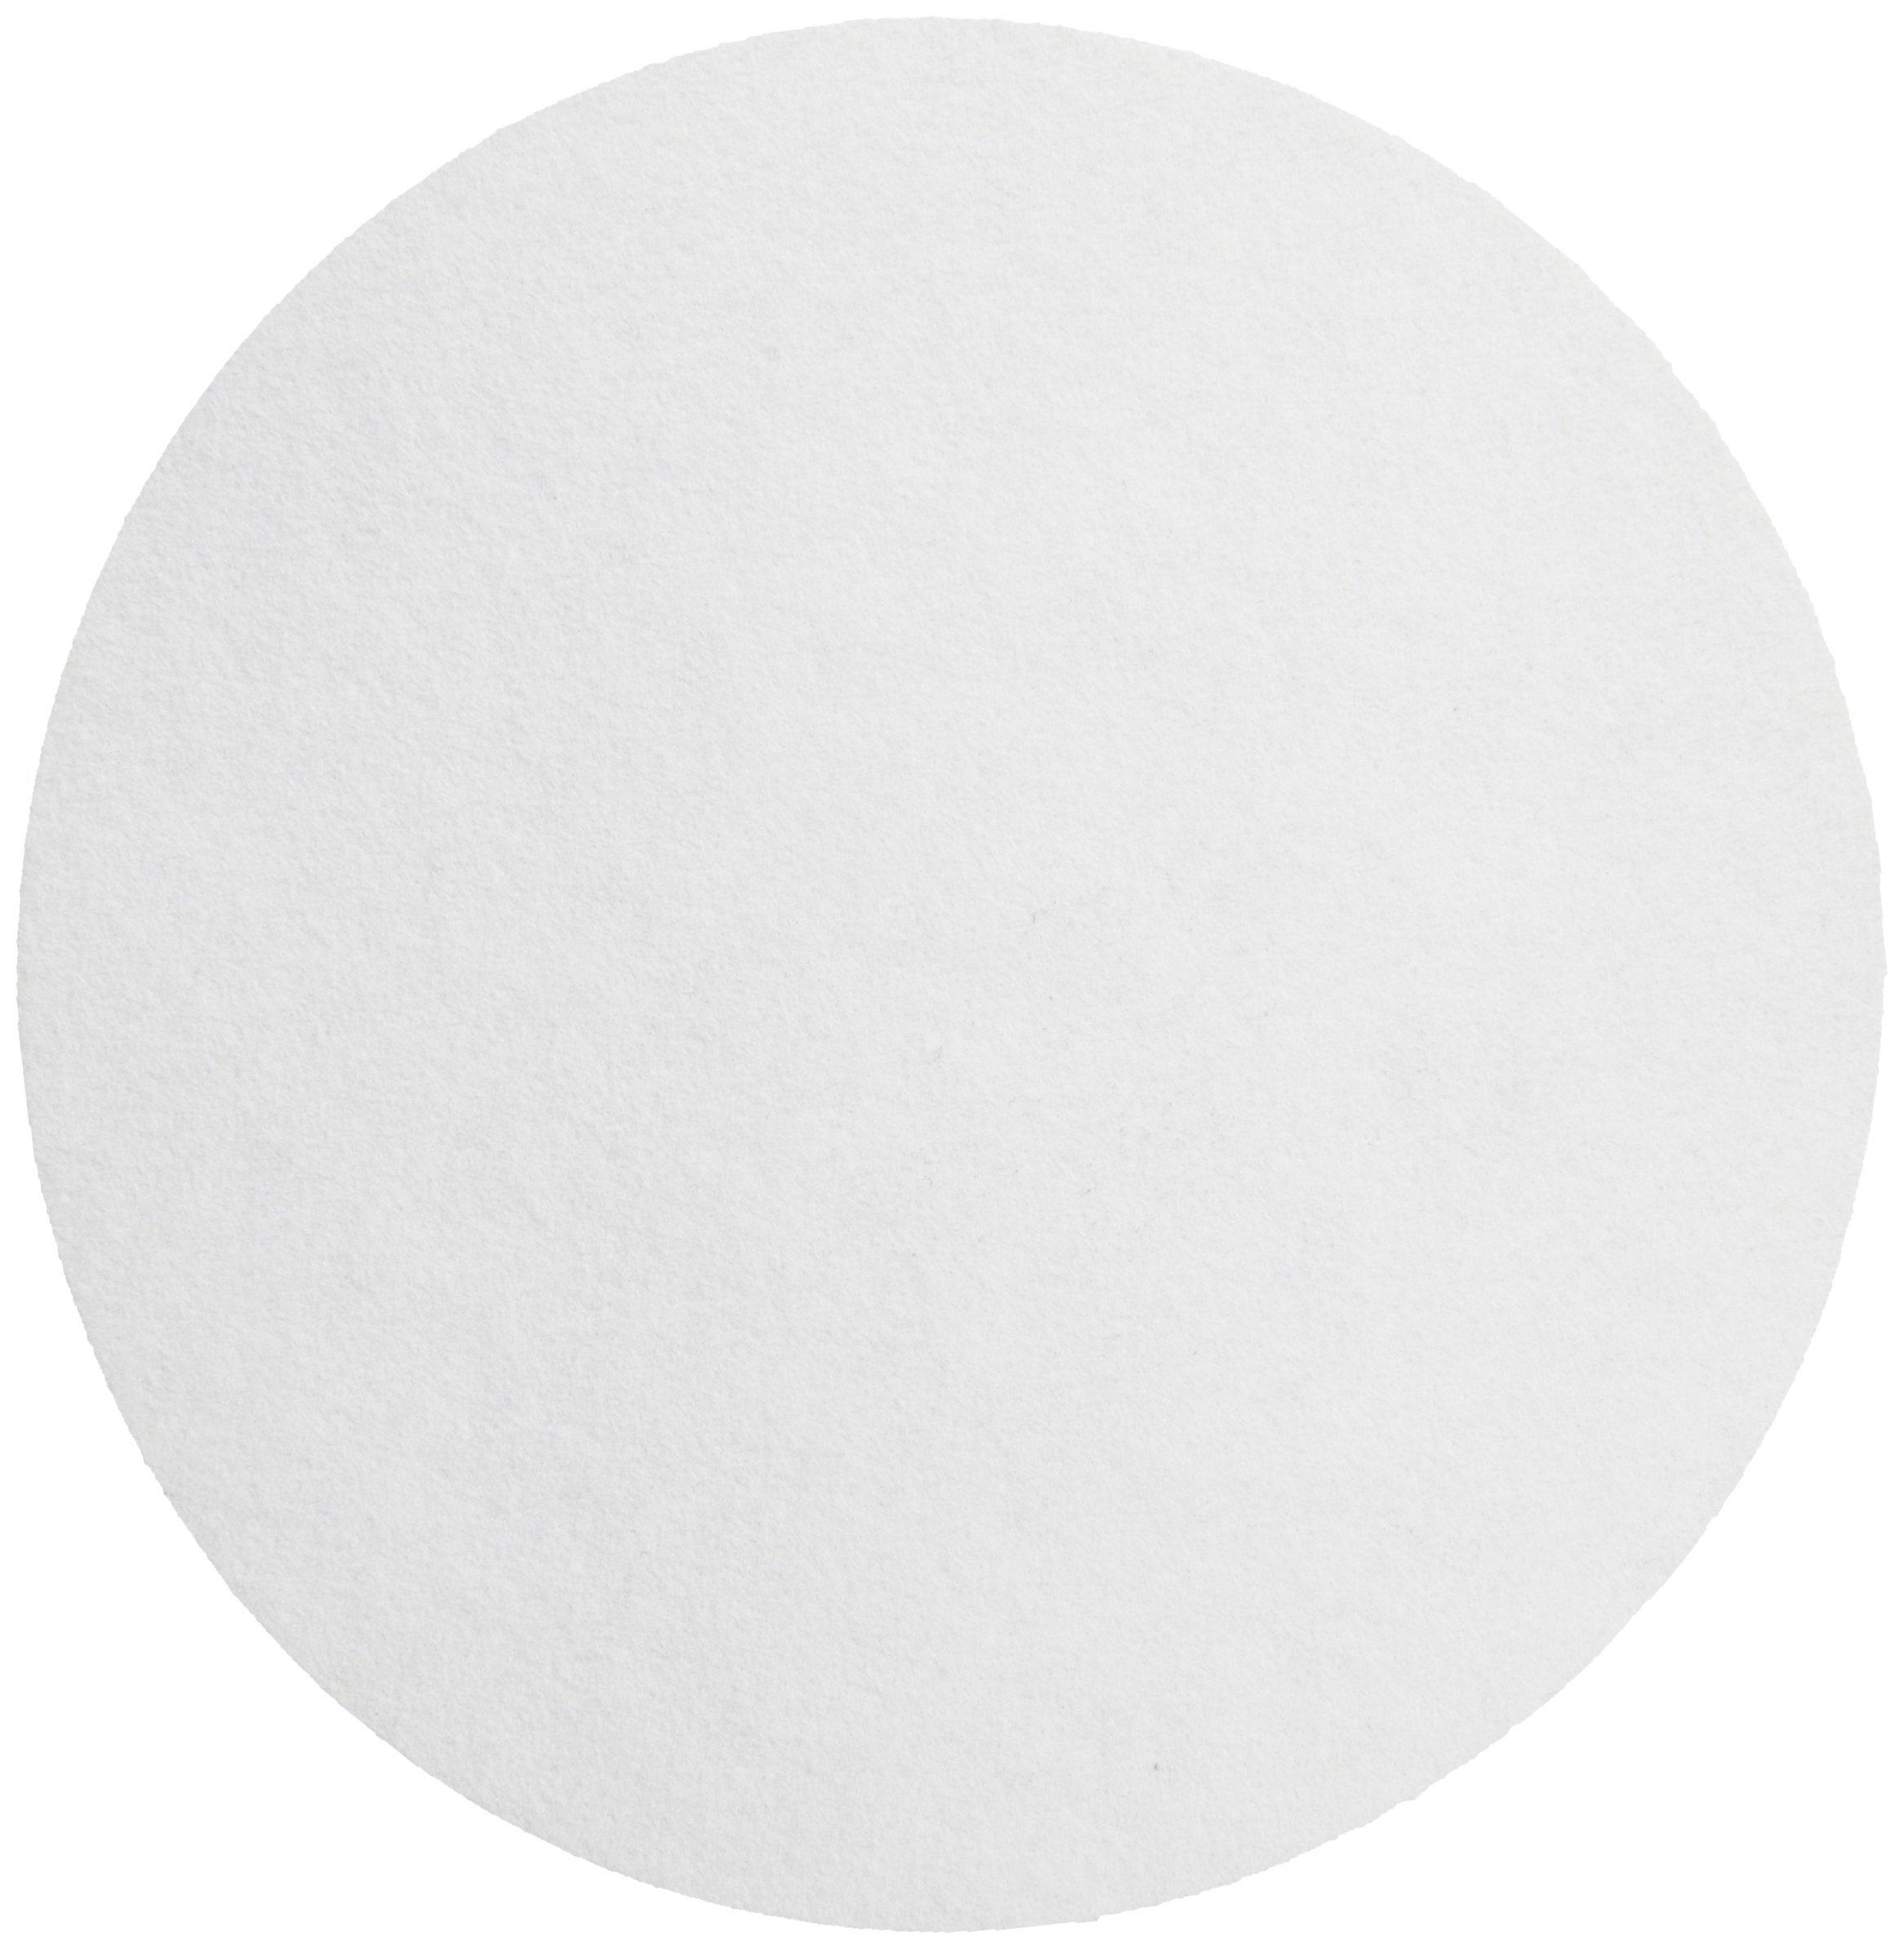 Whatman 1442-125 Ashless Quantitative Filter Paper, 12.5cm Diameter, 2.5 Micron, Grade 42 (Pack of 100) by Whatman